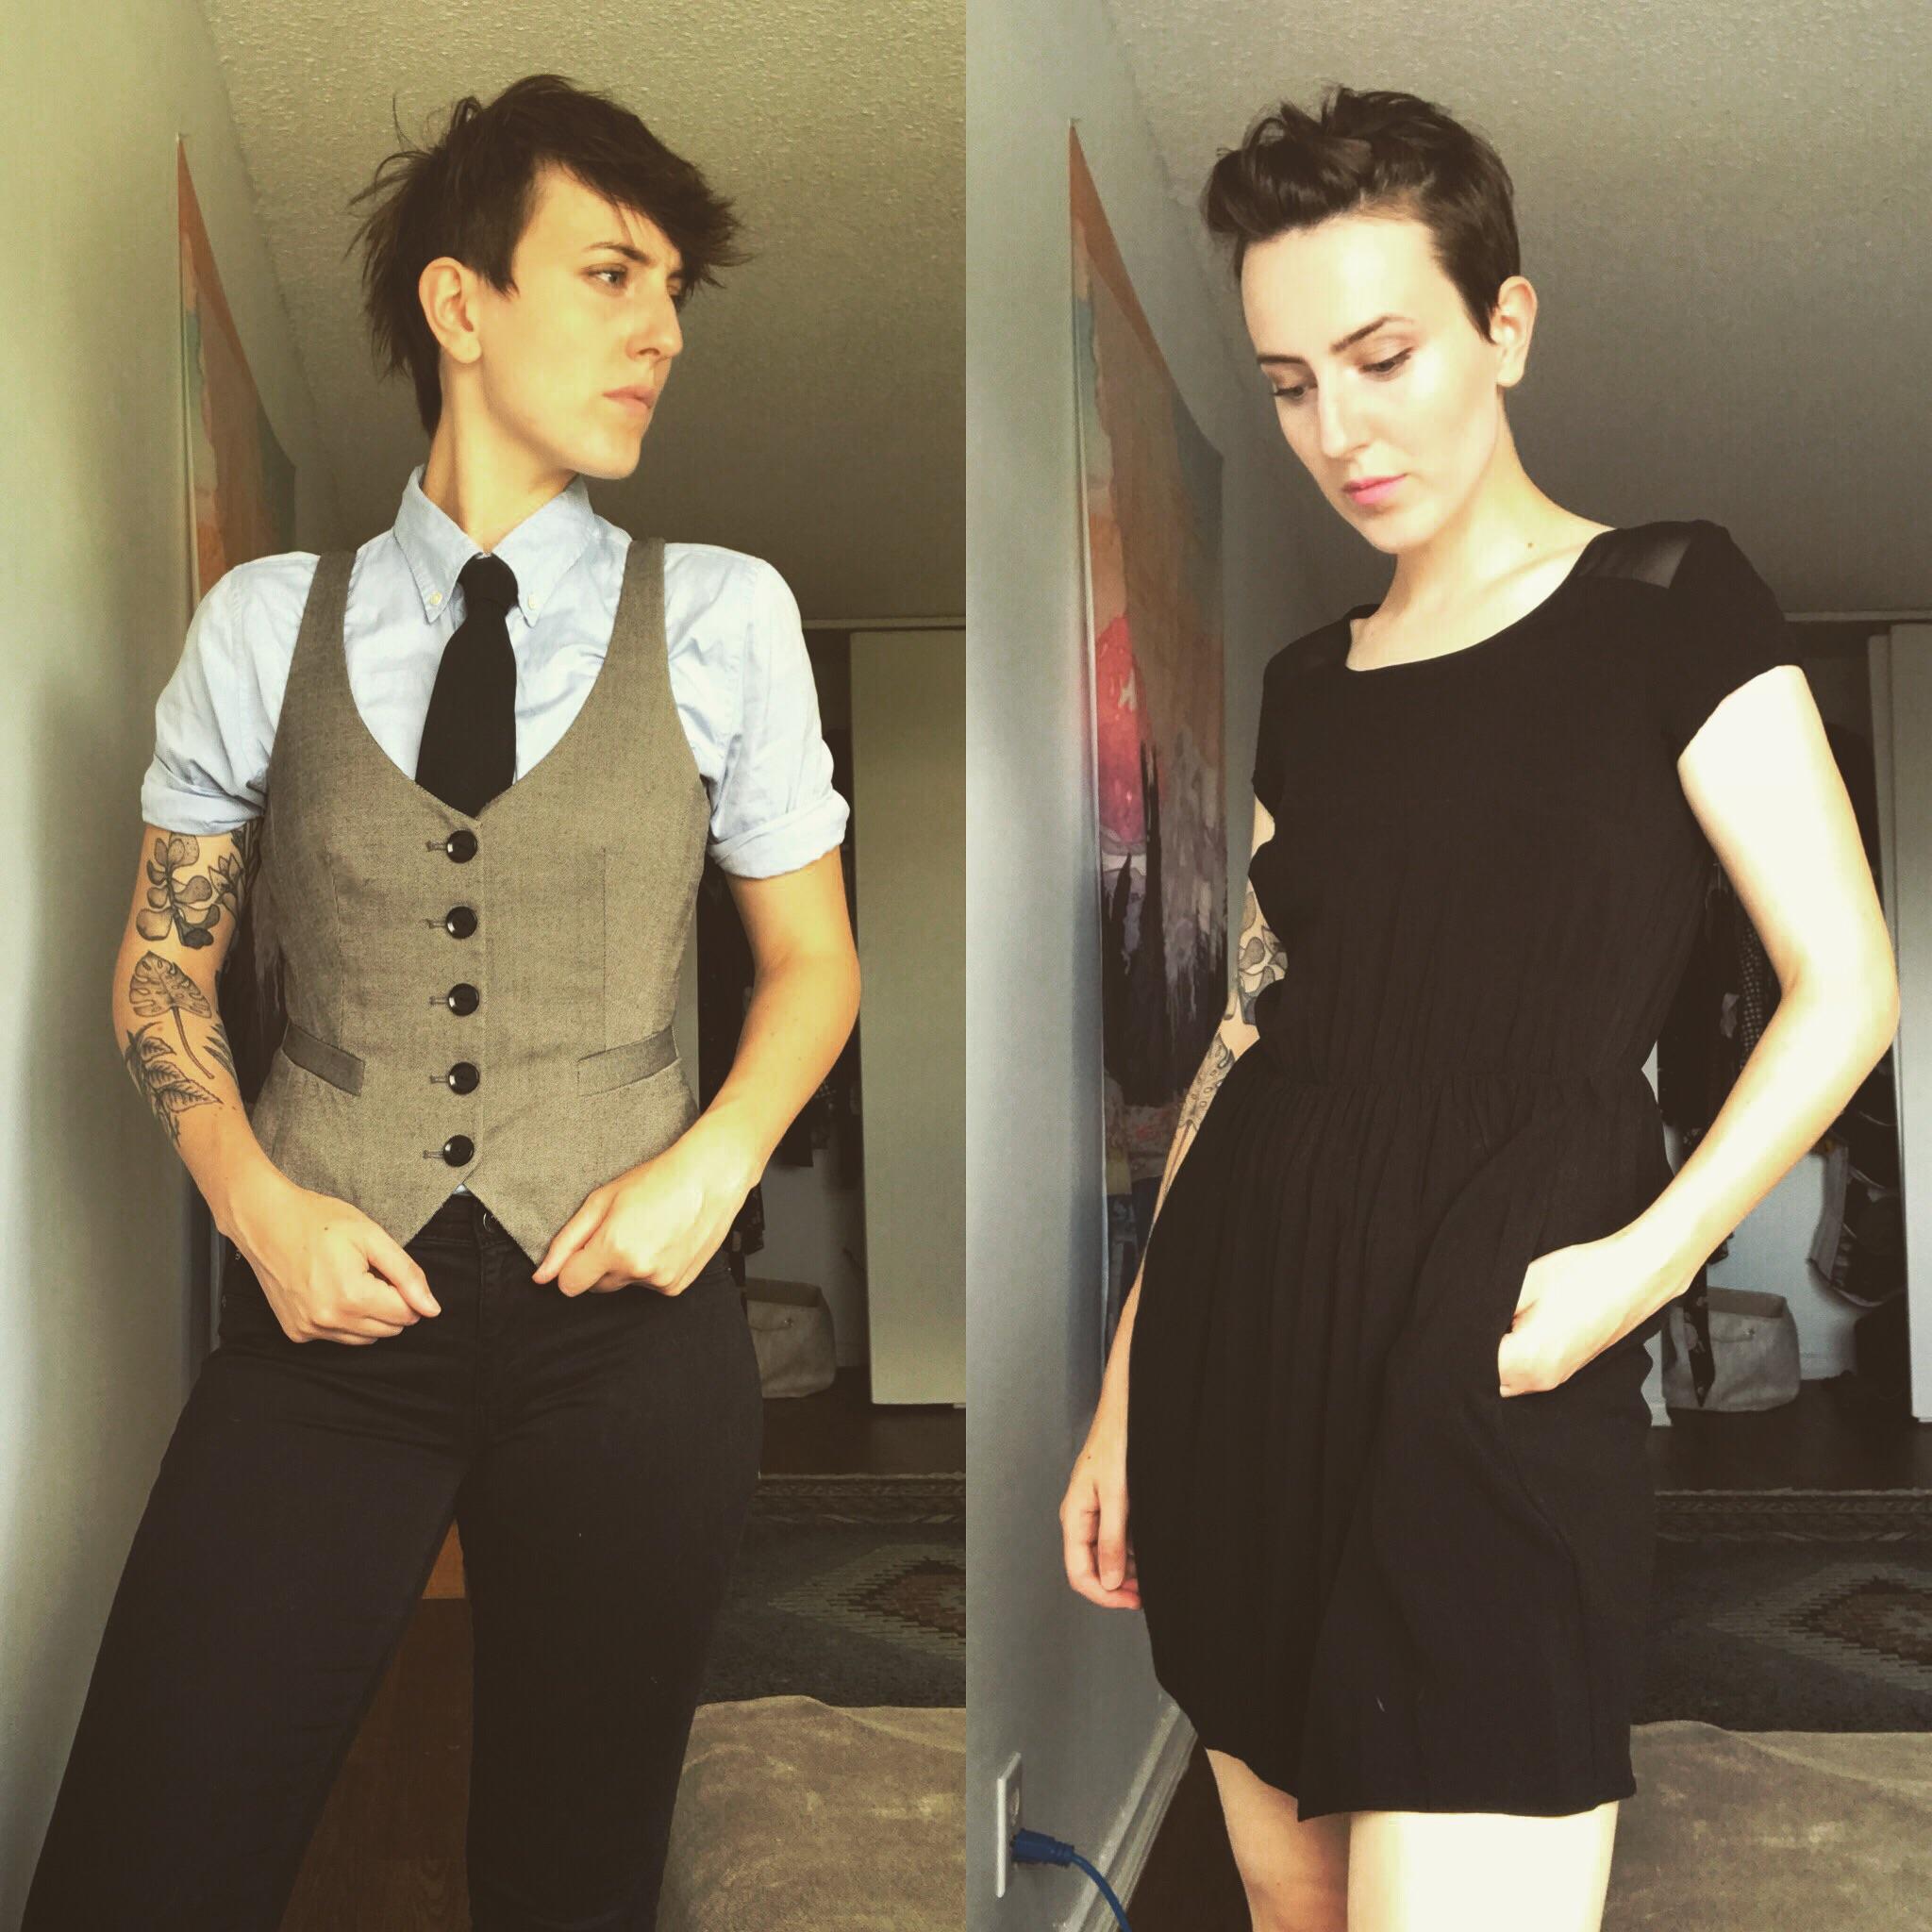 butch femme lesbianactually